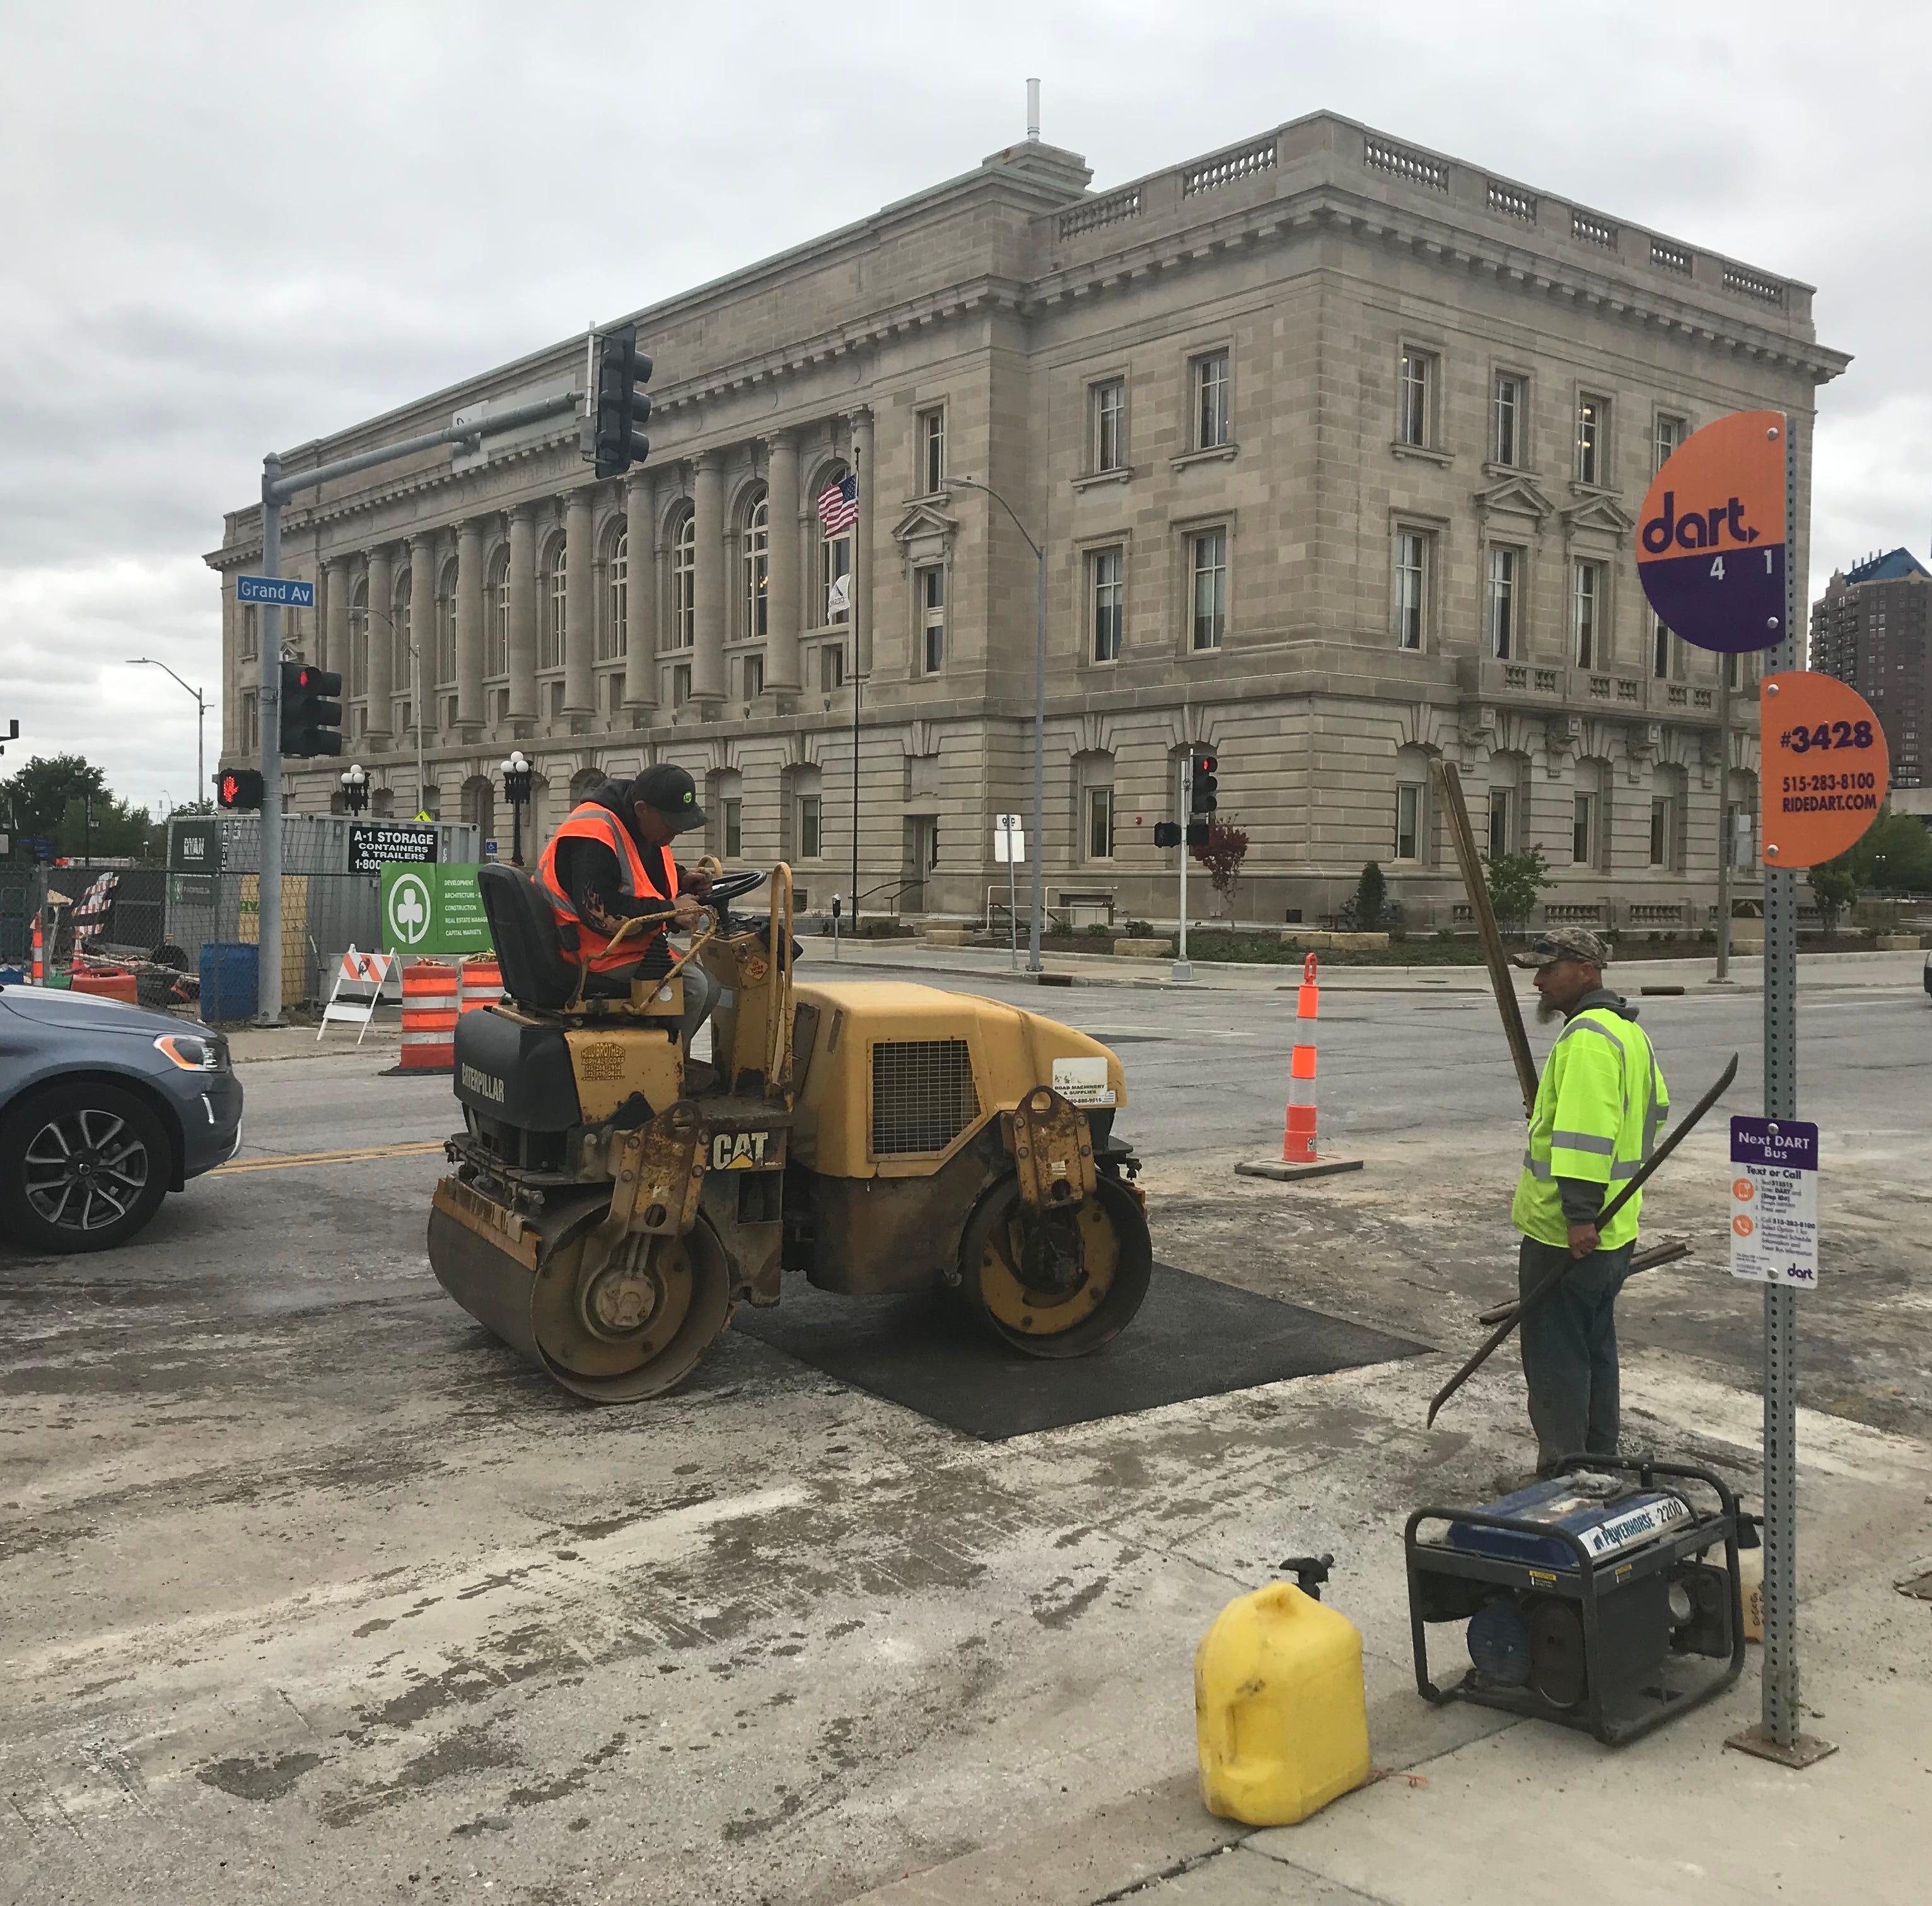 Des Moines changes 'confusing' bike lanes in East Village